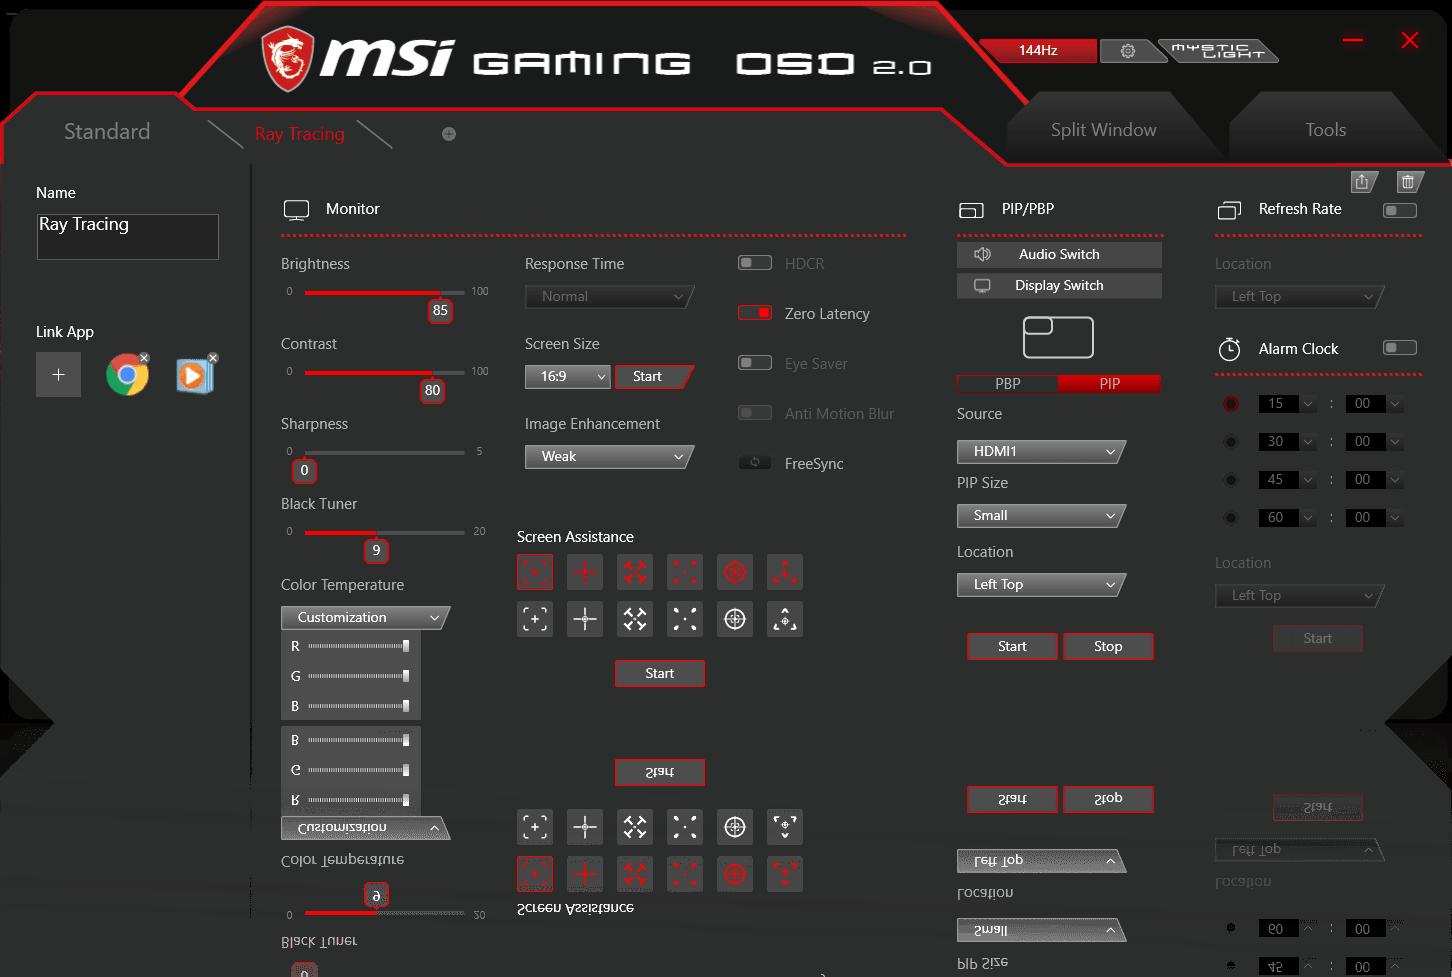 a screenshot of gaming OSD2.0